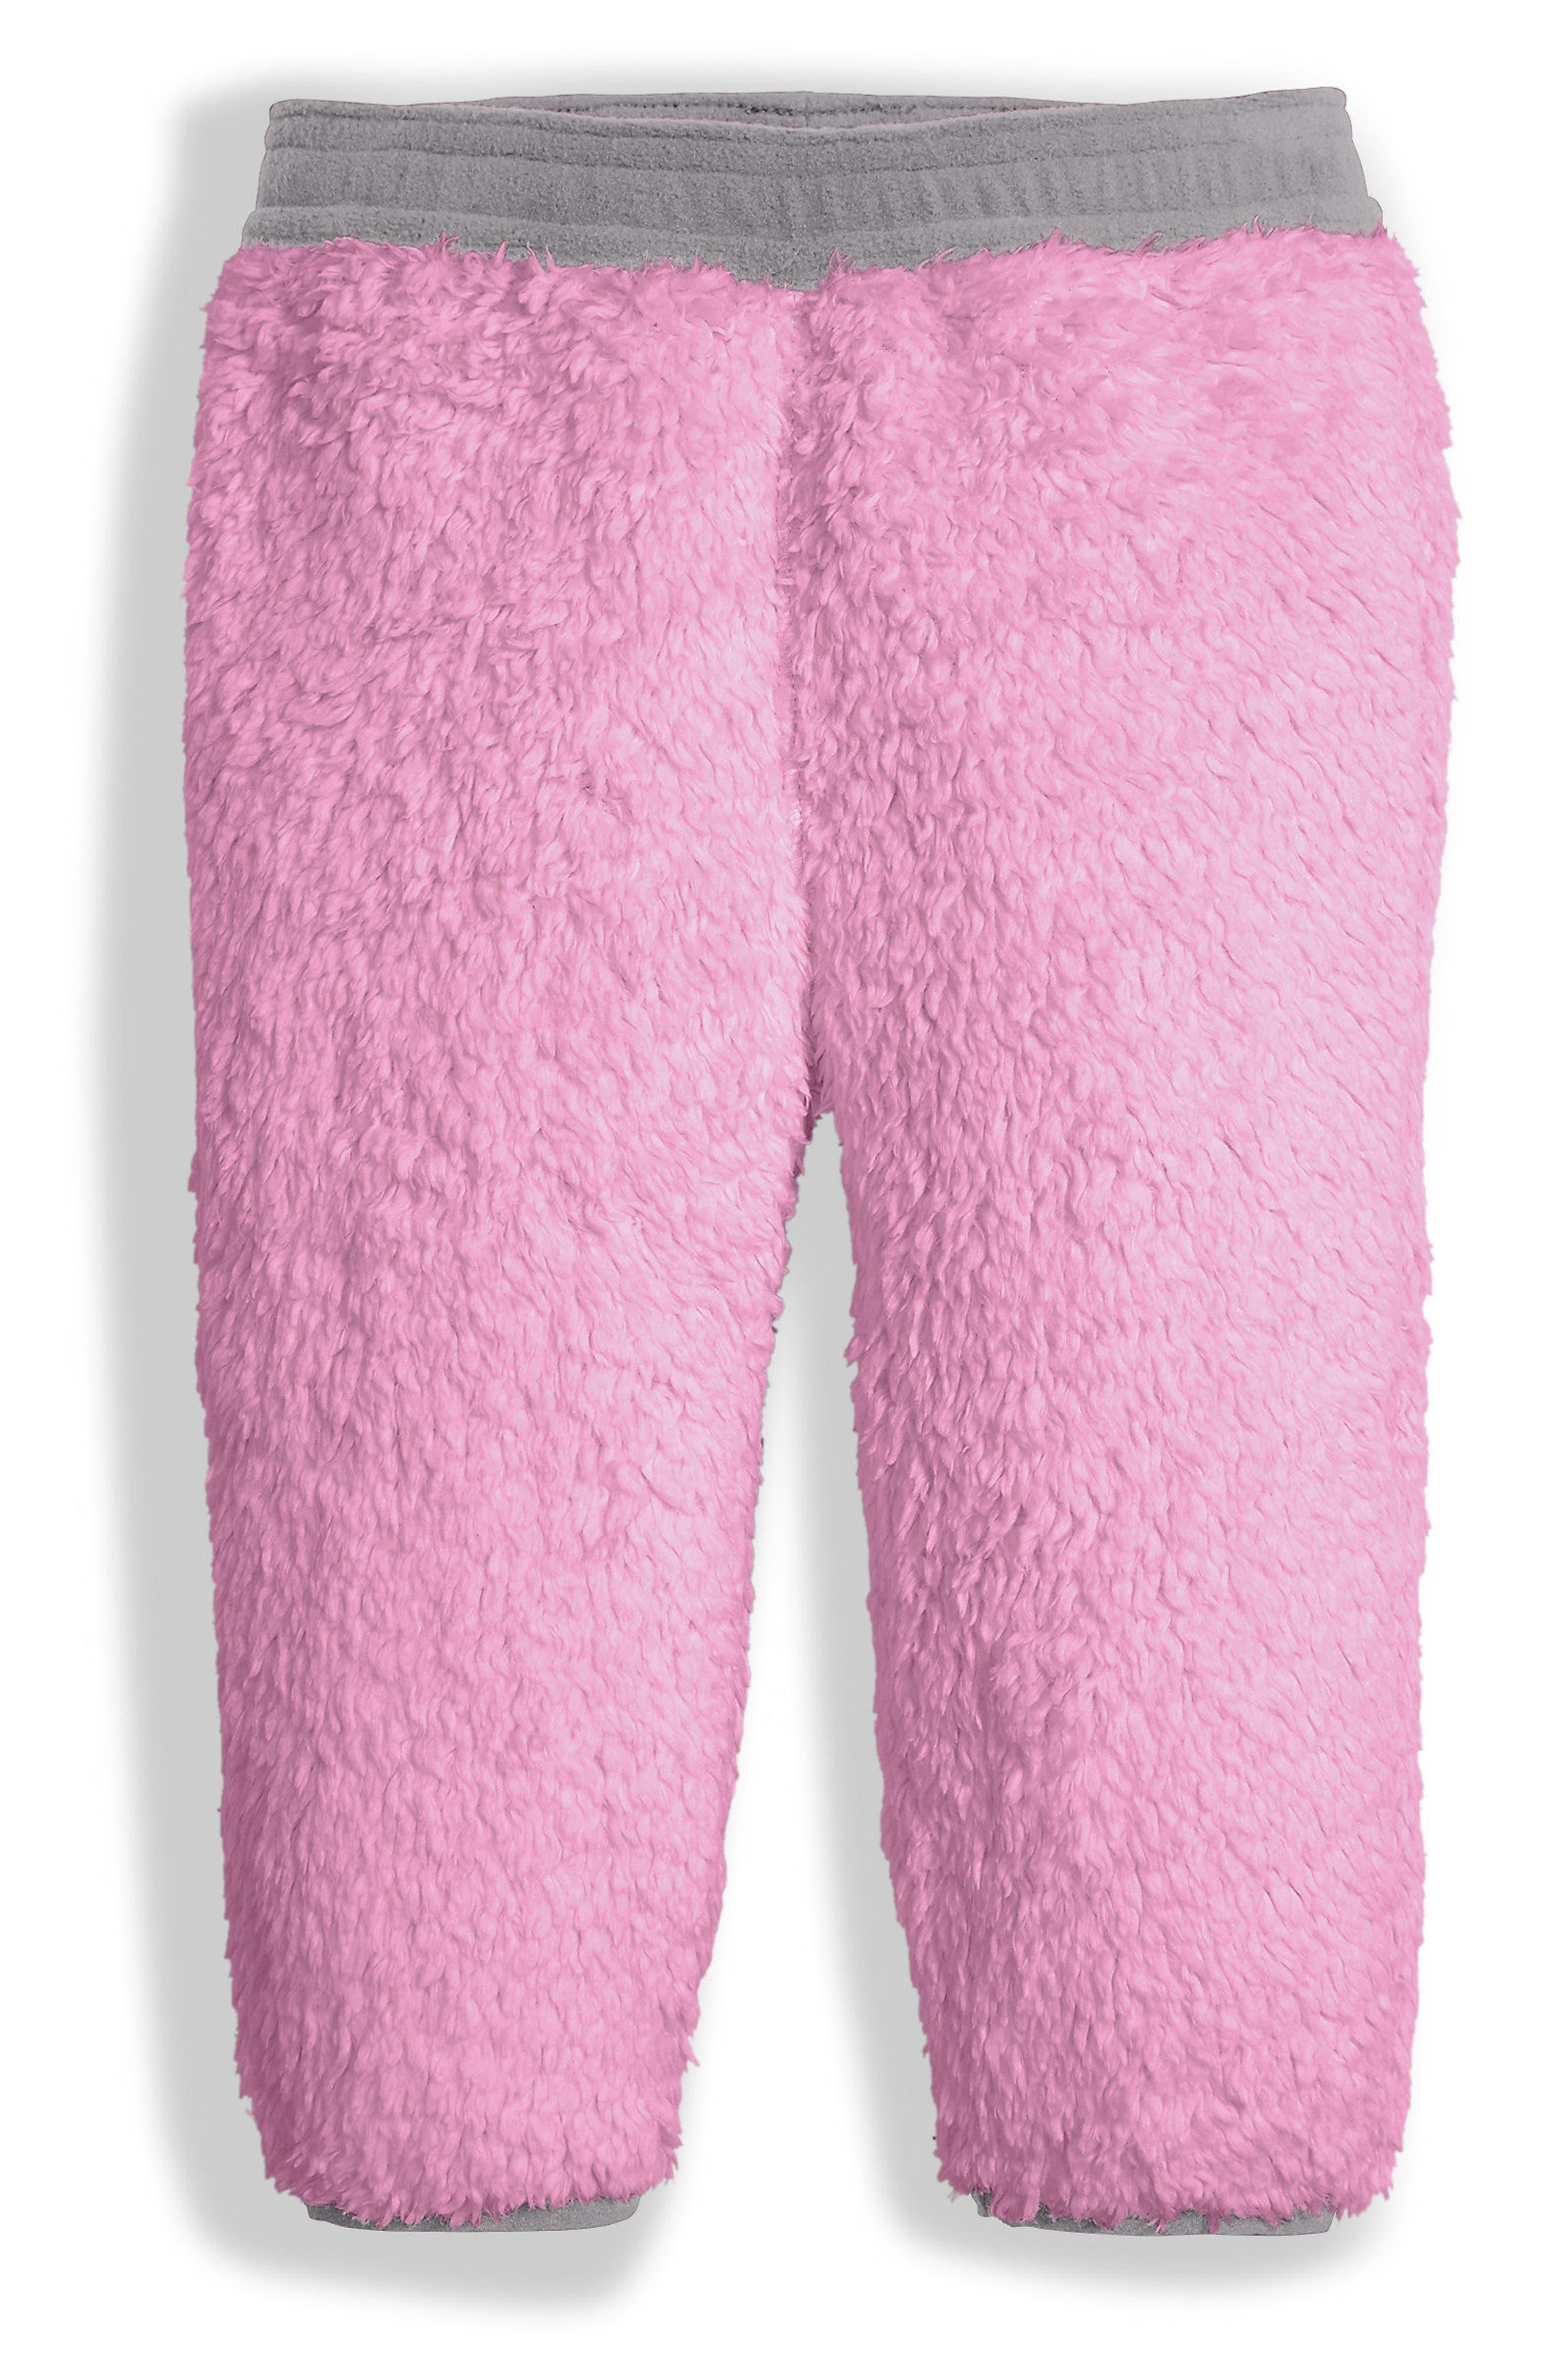 Plushee Pants,                             Main thumbnail 1, color,                             Lilac/ Sachet Pink